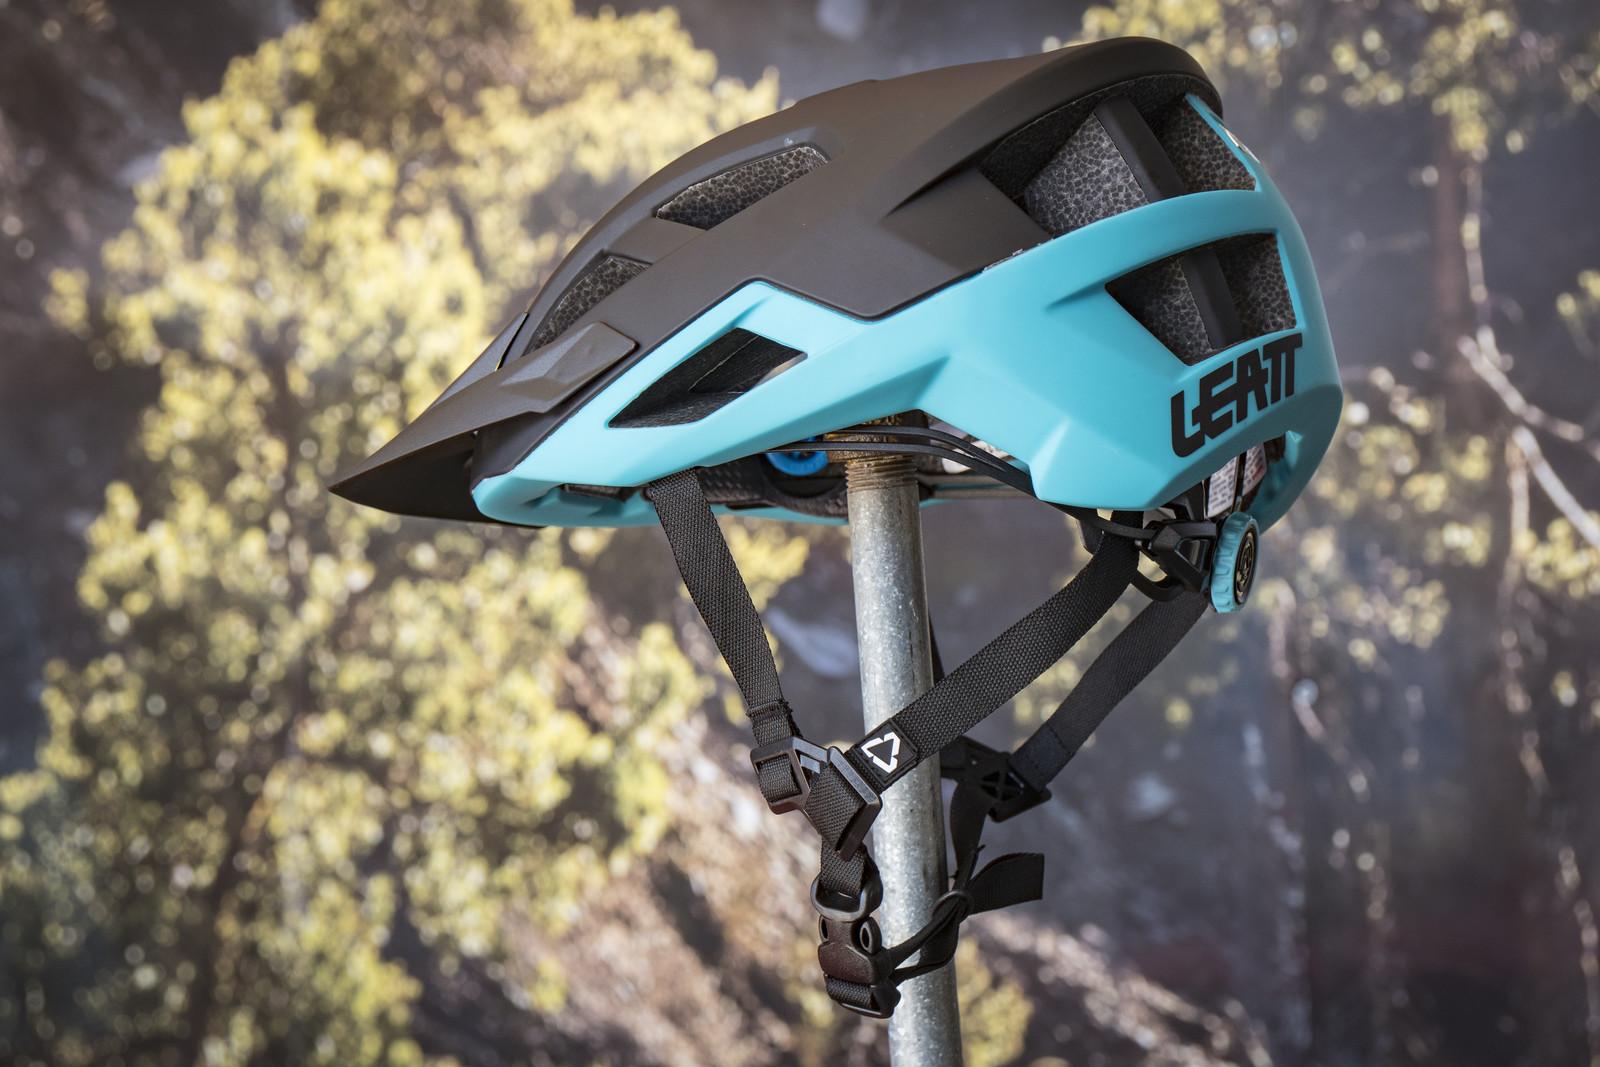 Leatt's DBX 2.0 Helmet Makes Anti-Rotational Technology More Affordable - Sea Otter Classic